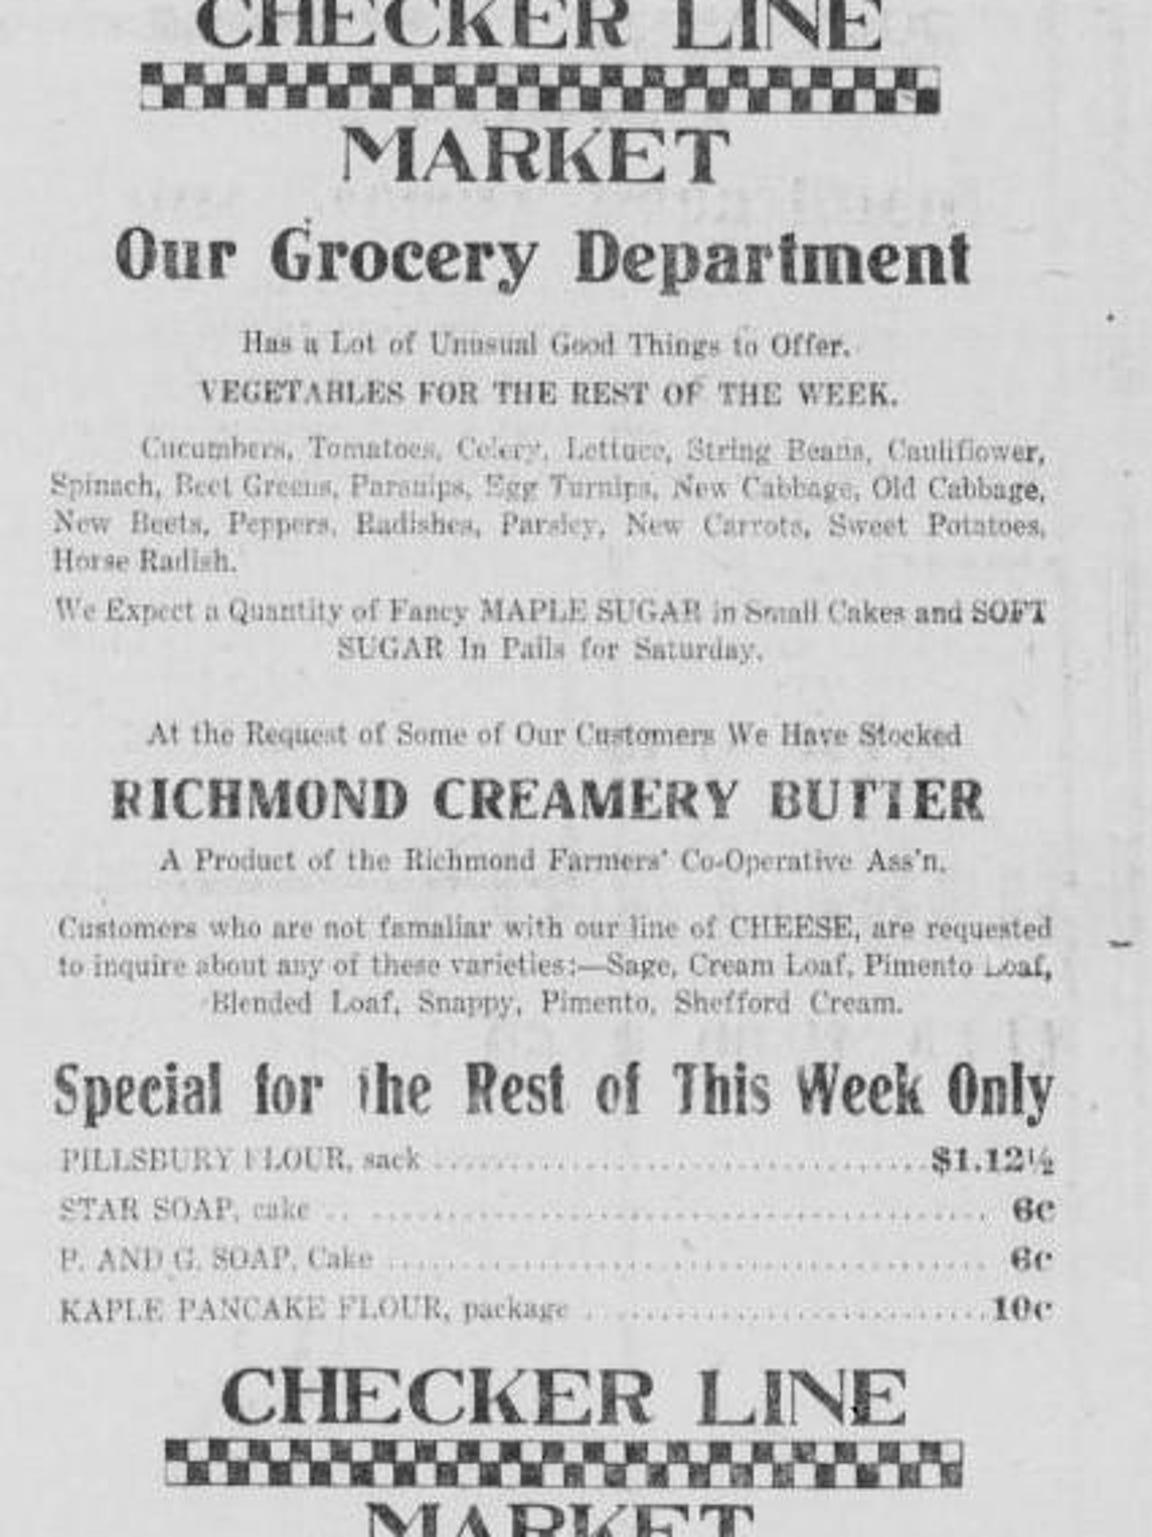 Advertisement featuring Richmond Creamery Butter from